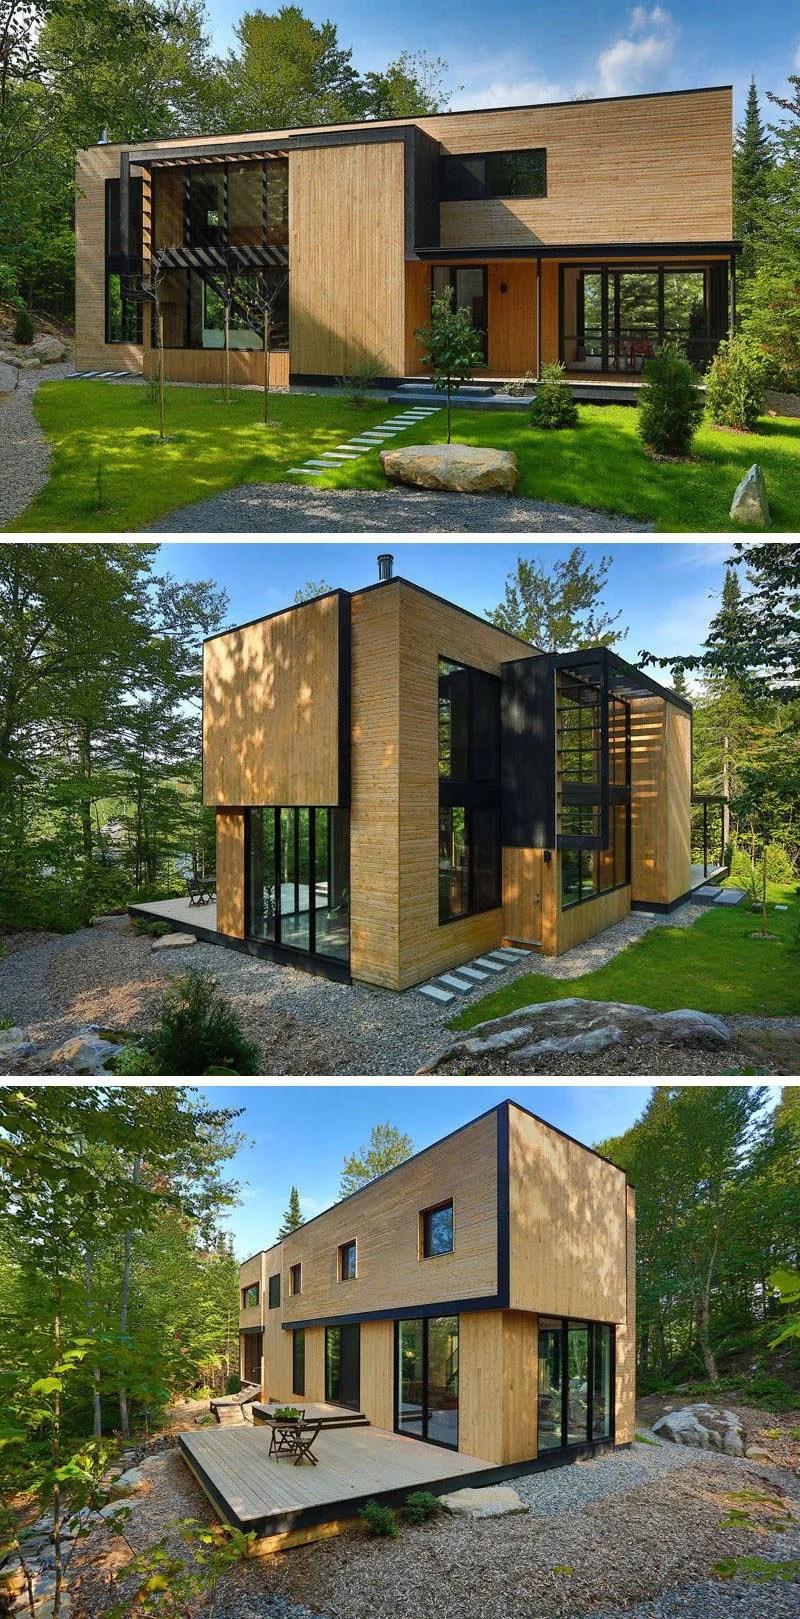 16 Bit Forest Home - wood-clad-house-201216-456-05-800x1619_Wonderful 16 Bit Forest Home - wood-clad-house-201216-456-05-800x1619  Pic_815617.jpg